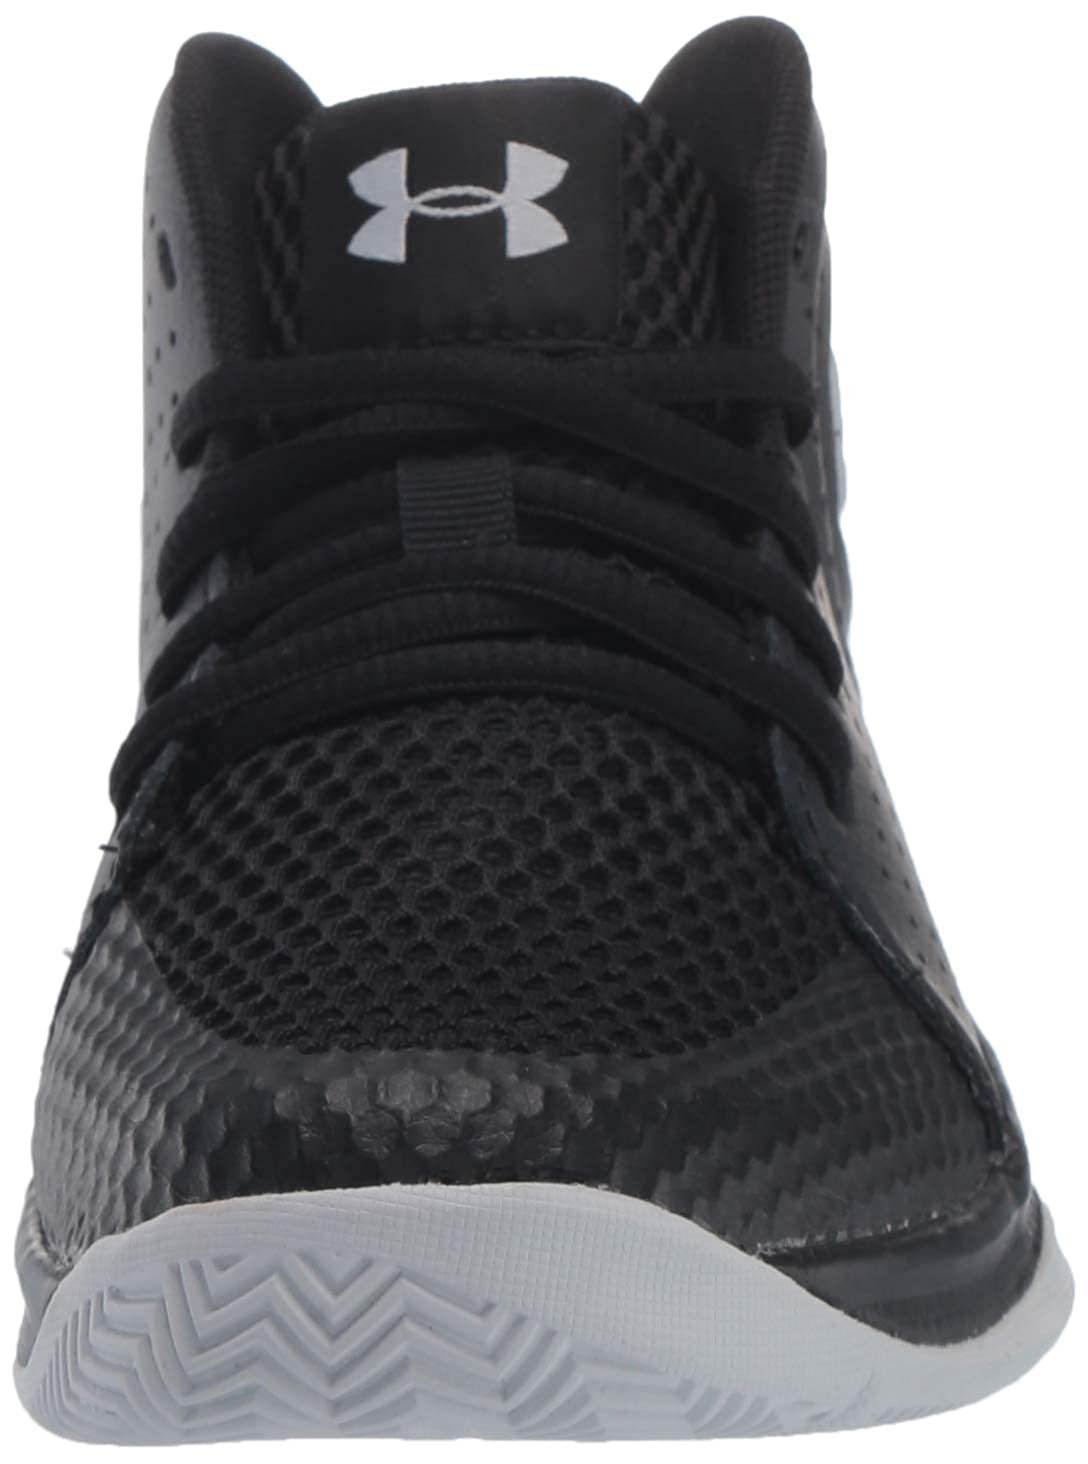 Zapatos de Baloncesto Unisex Ni/ños Under Armour UA GS Jet 2019